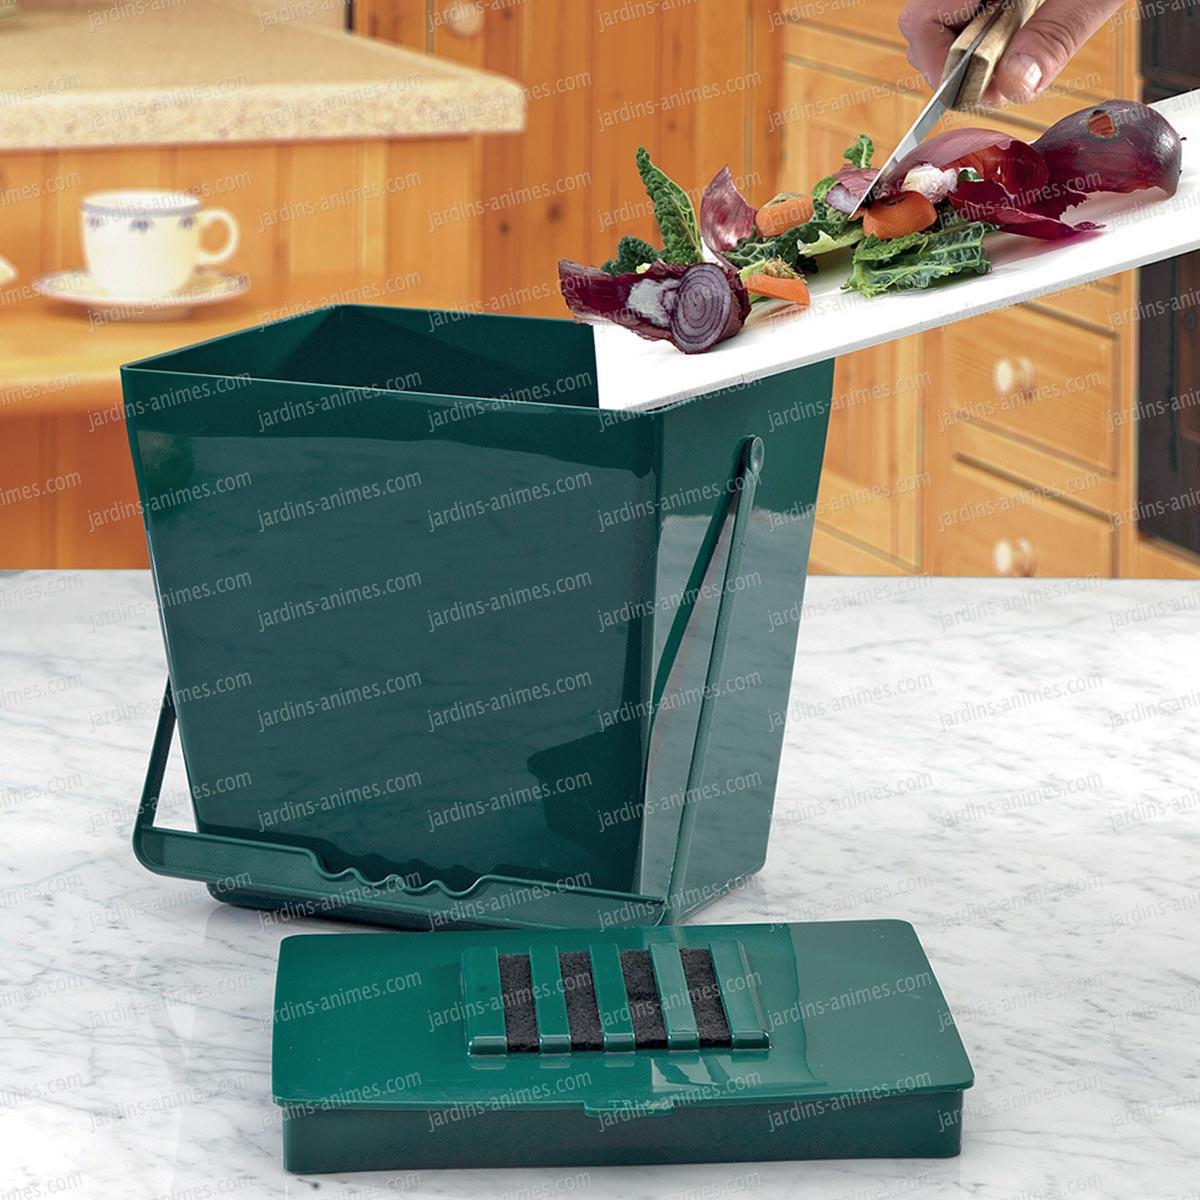 Bio seau anti odeur 5l vert accessoire ustensile cuisine for Anti odeur maison